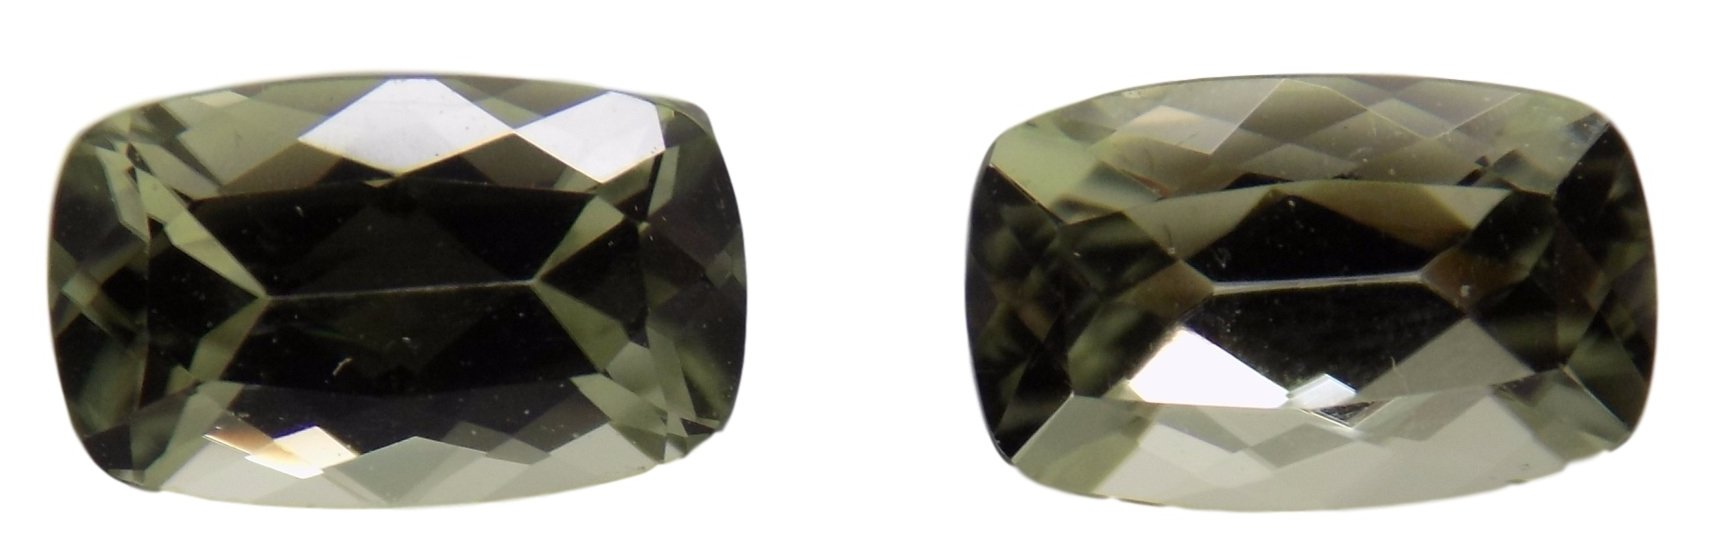 Zultanite Natural Loose Gemstone 8x5mm Cushion Cut Pair (2) 2.57 CTTW Cert of Auth B004